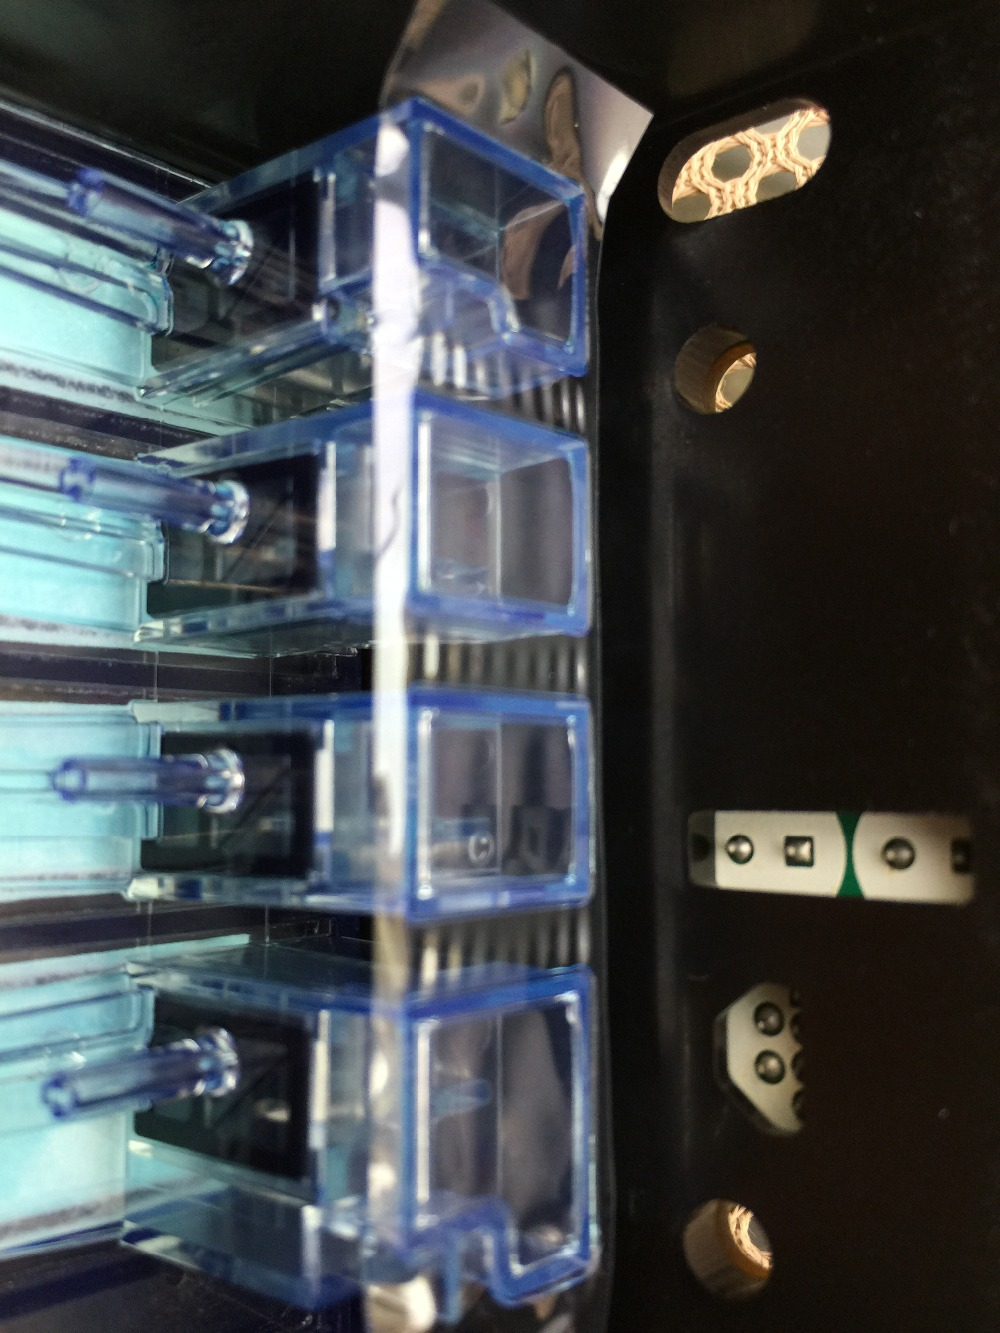 50PCS Brand NEW  PRINTHEAD Genuine OEM Print Head For HP 932 933 for HP 6100 6600 6700 7110 7610 932xl 933xl 932 933 printhead for hp officejet pro 6100 6600 6815 6700 7610 7110 printer head for hp 932 hp933 printhead